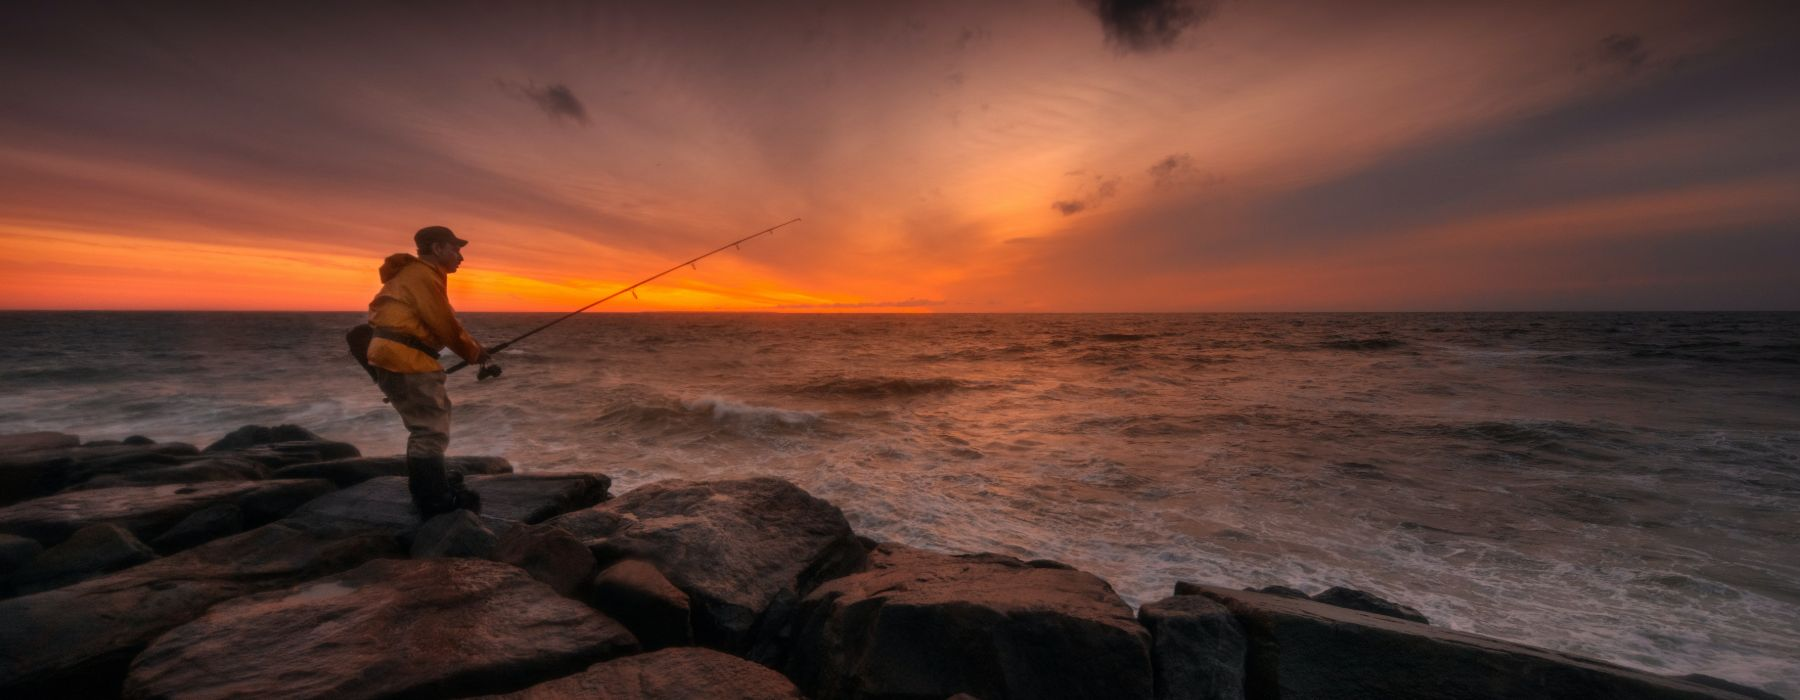 saltwater fishing tackle bournemouth